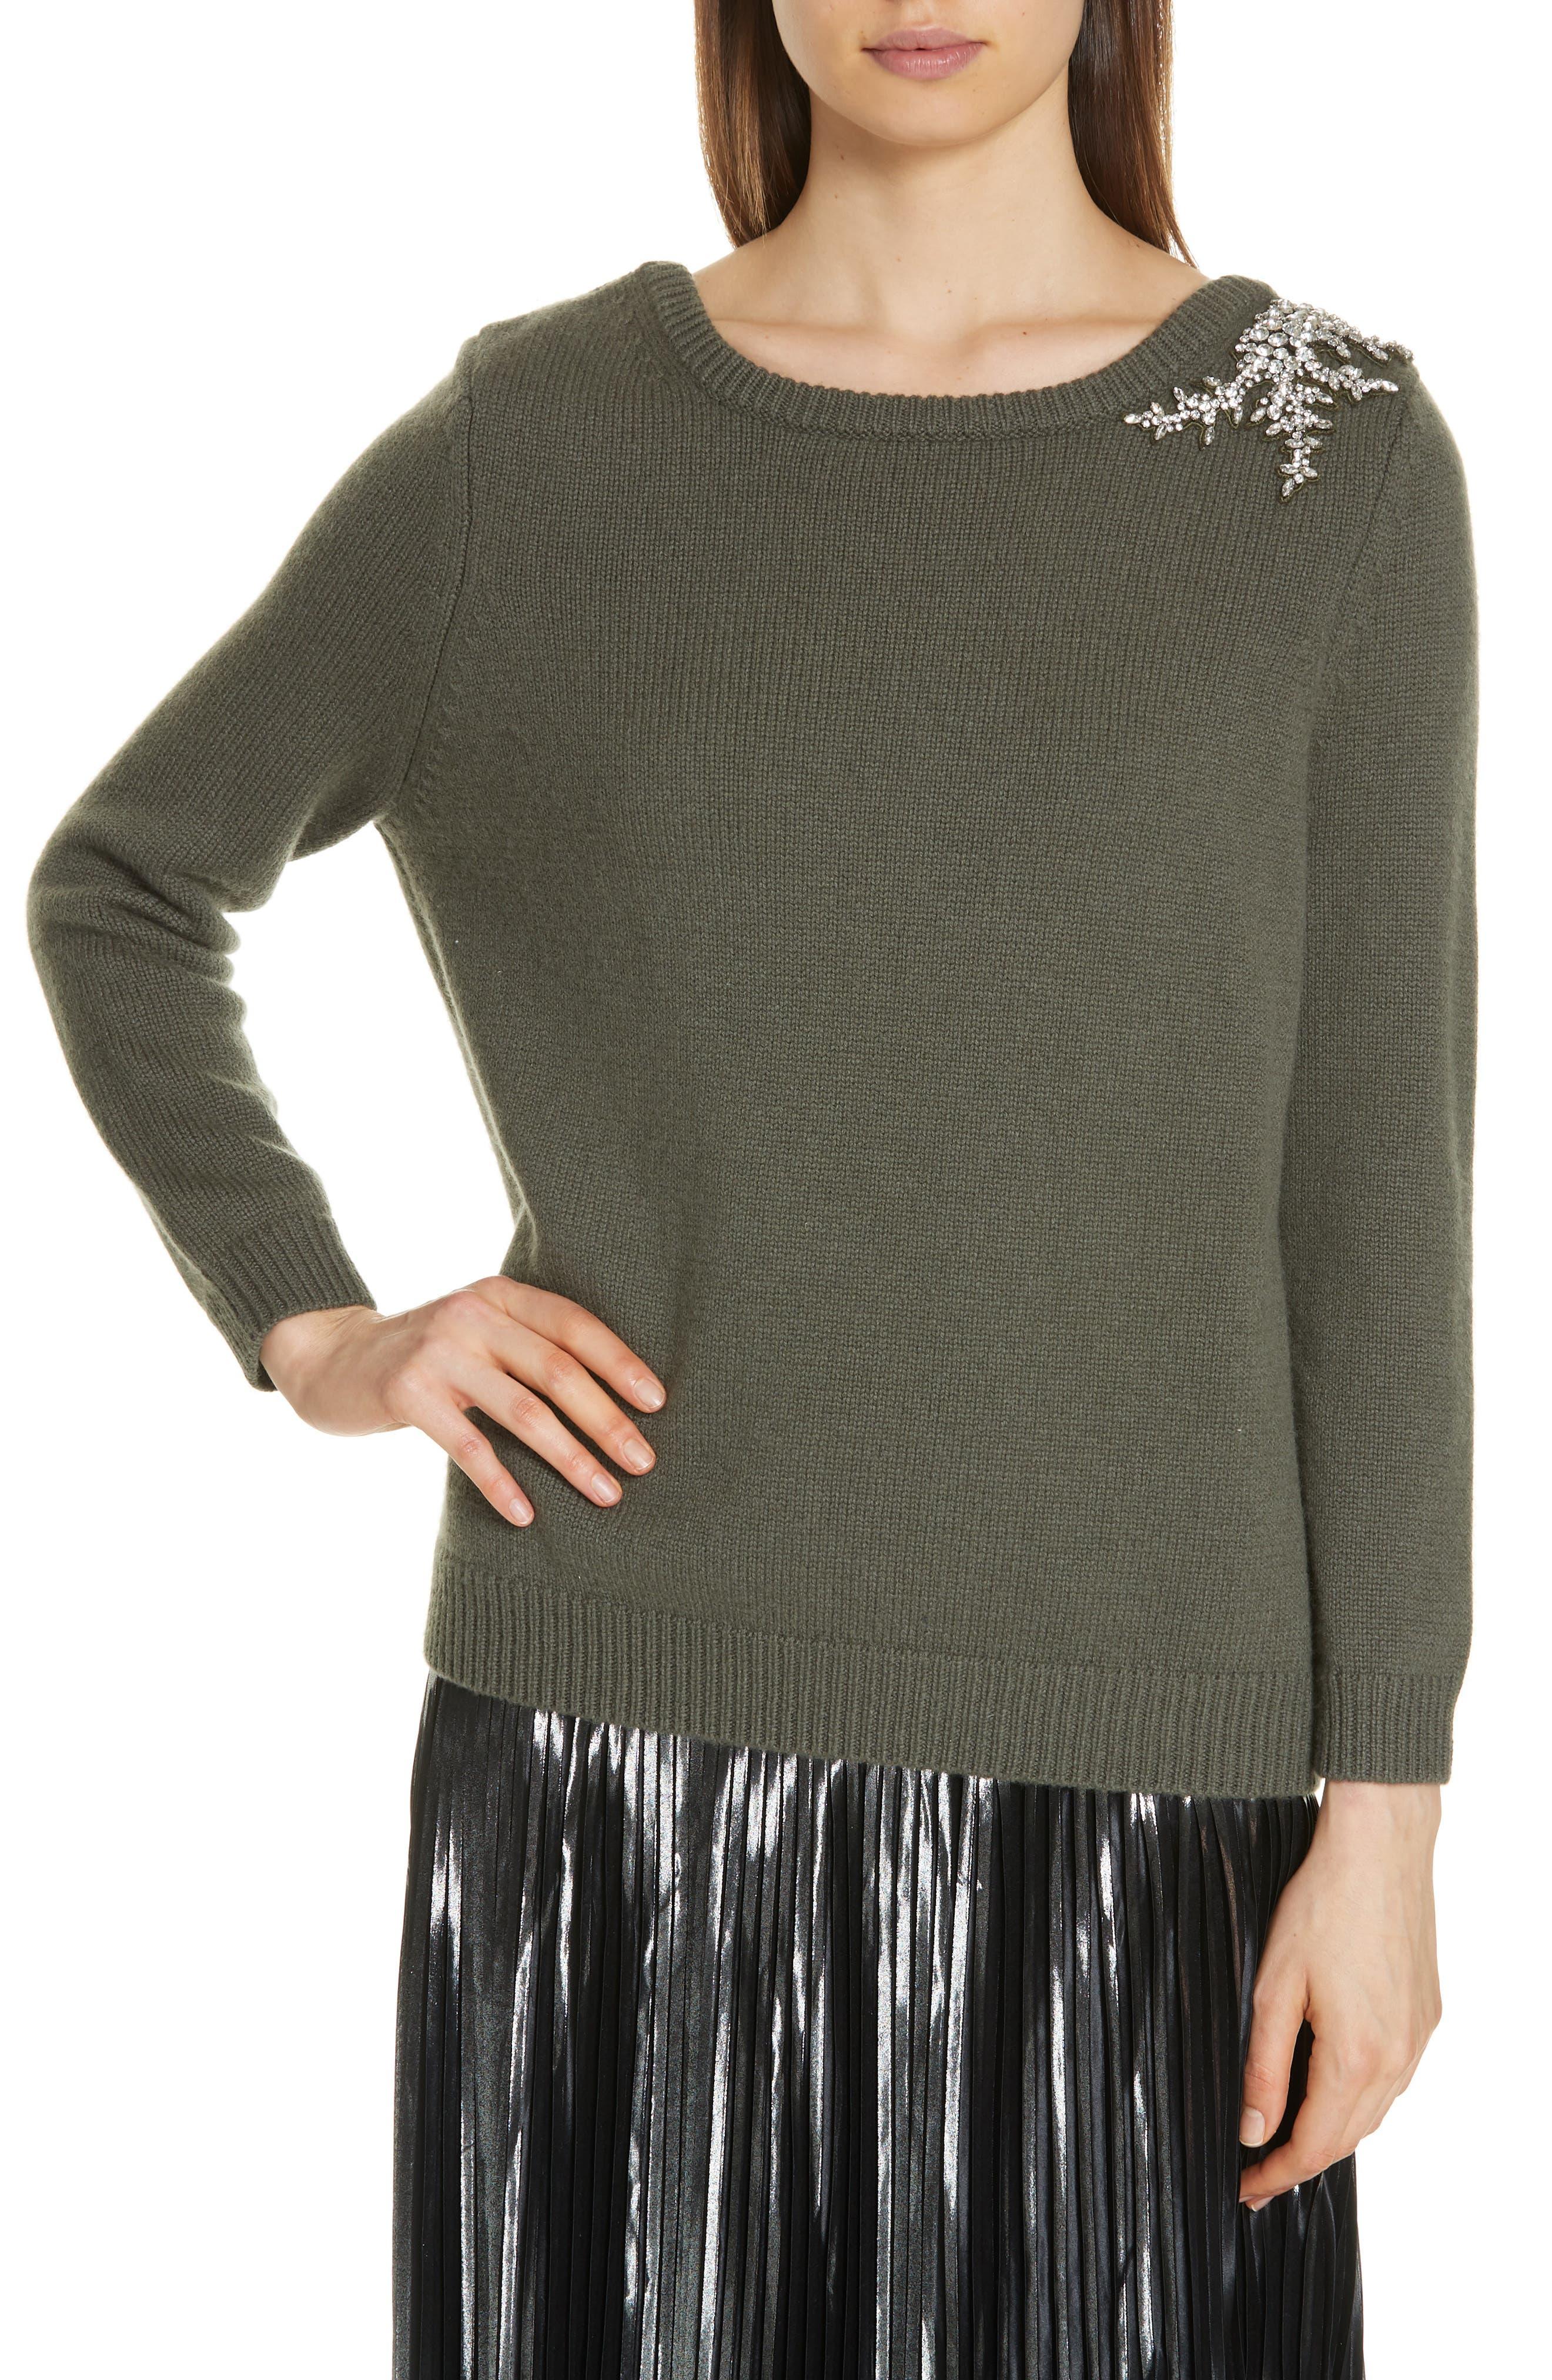 Ba & sh Ourea Jewel Detail Wool Cashmere Sweater, Brown